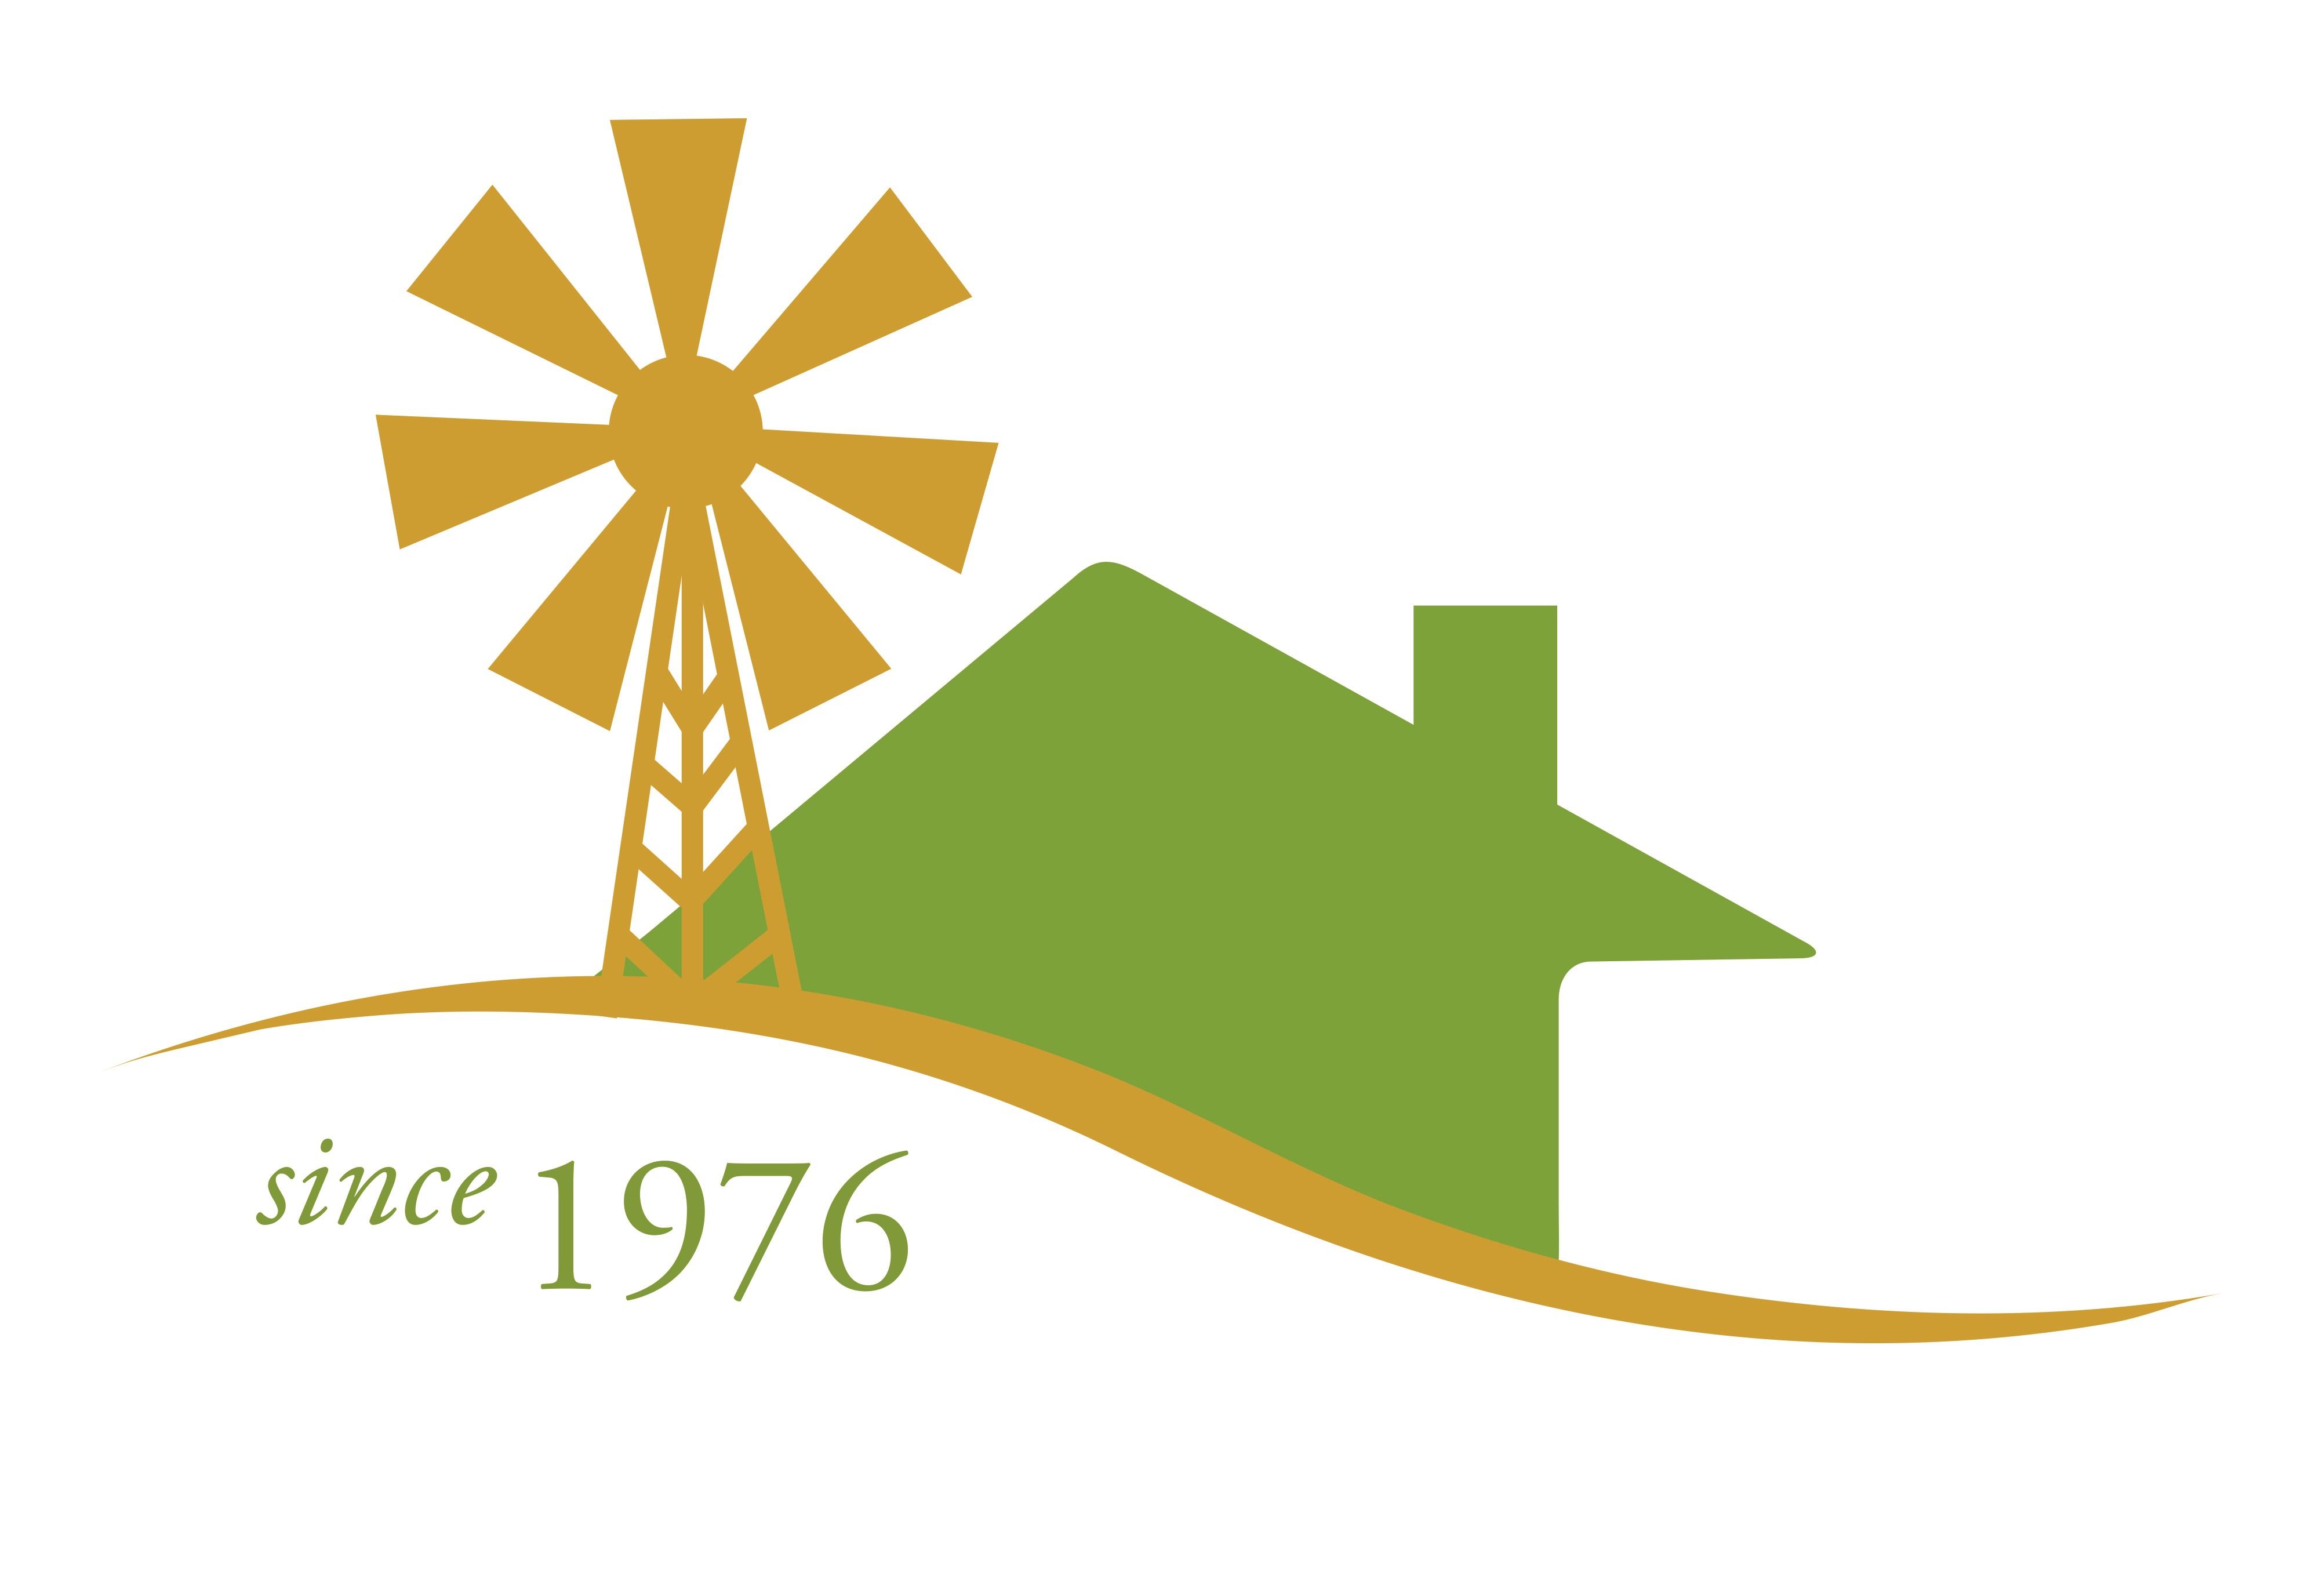 logo since 1976